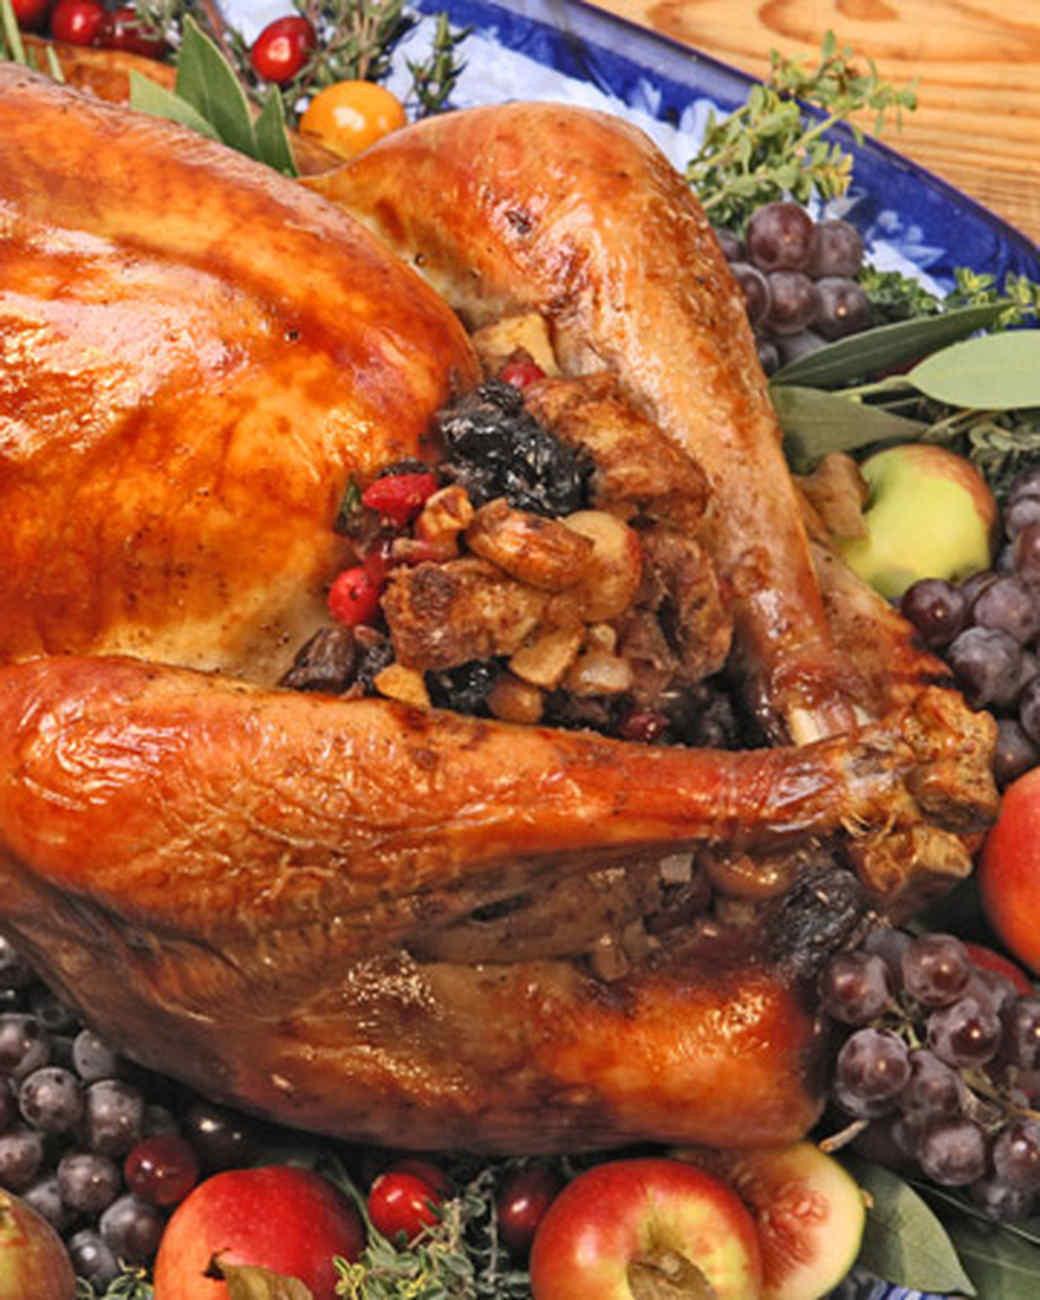 Recipes For Thanksgiving Turkey  38 Terrific Thanksgiving Turkey Recipes